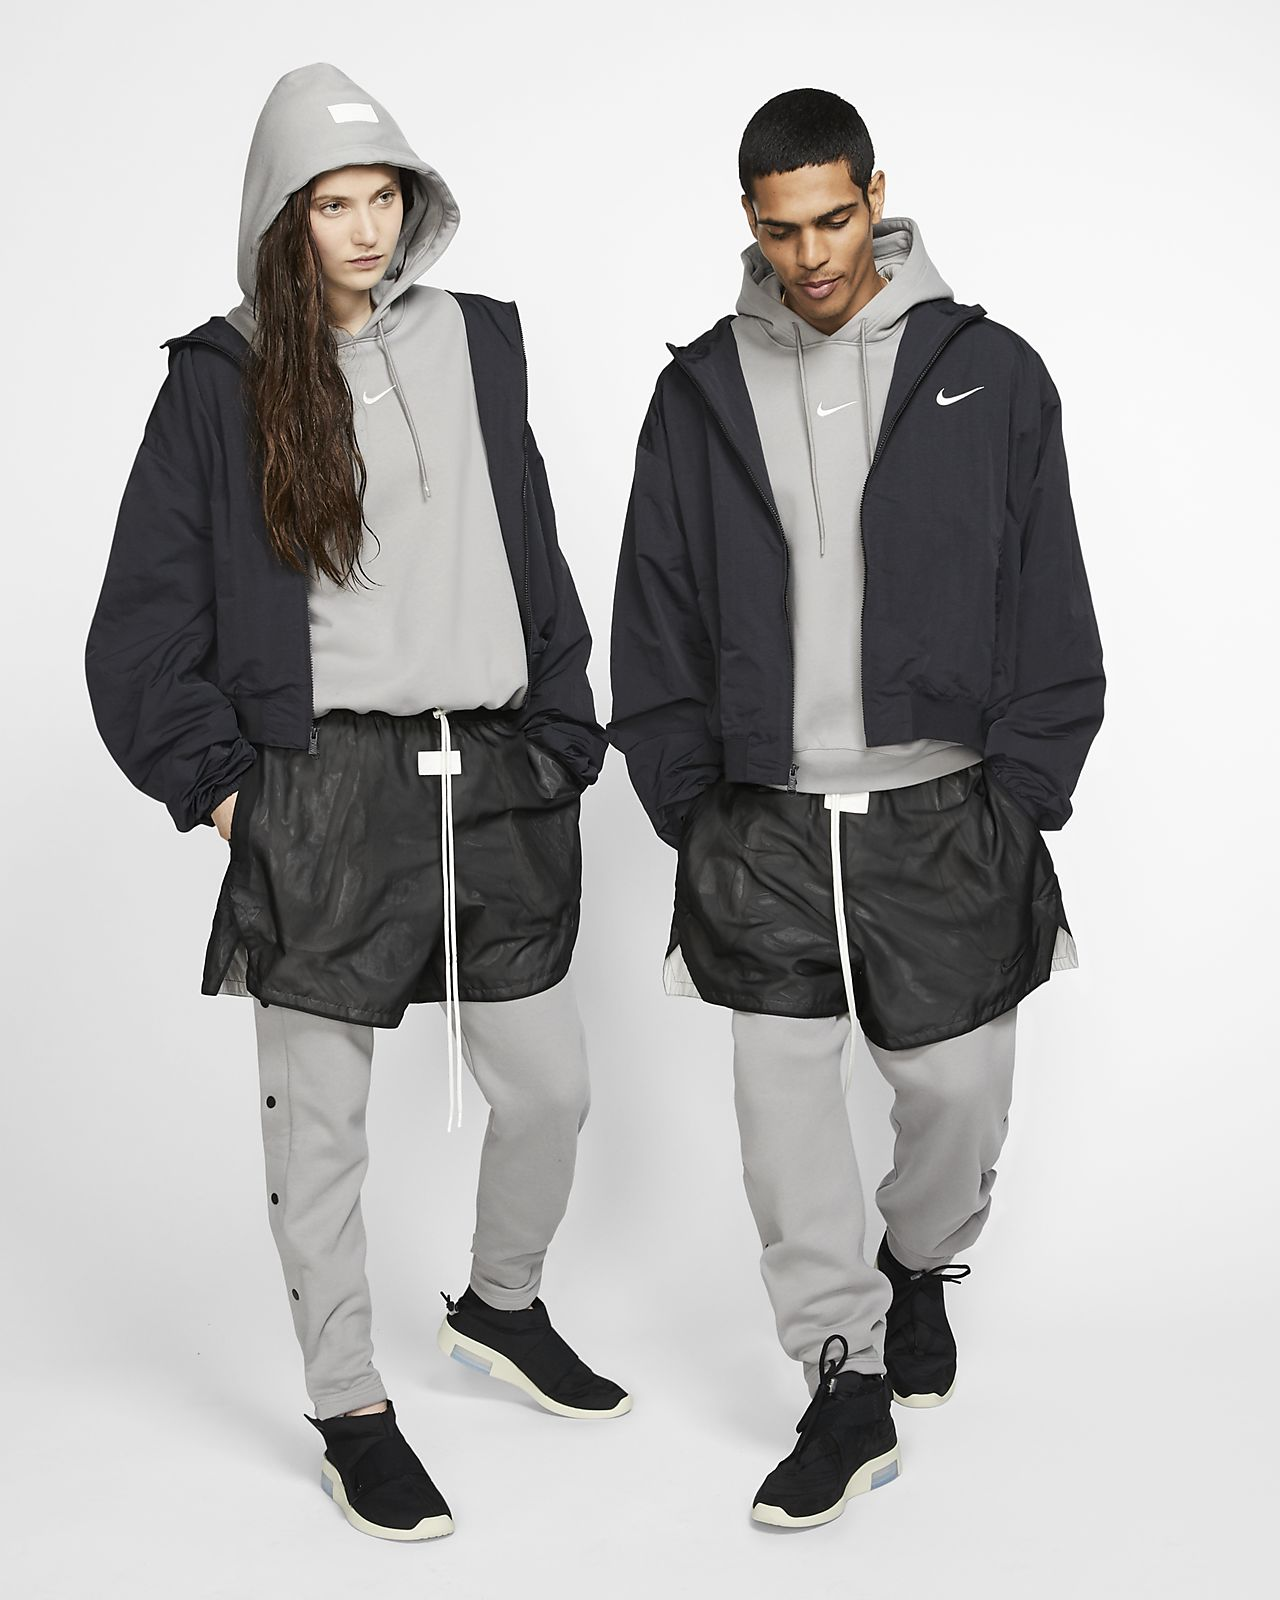 Nike x Fear of God Pantalón corto